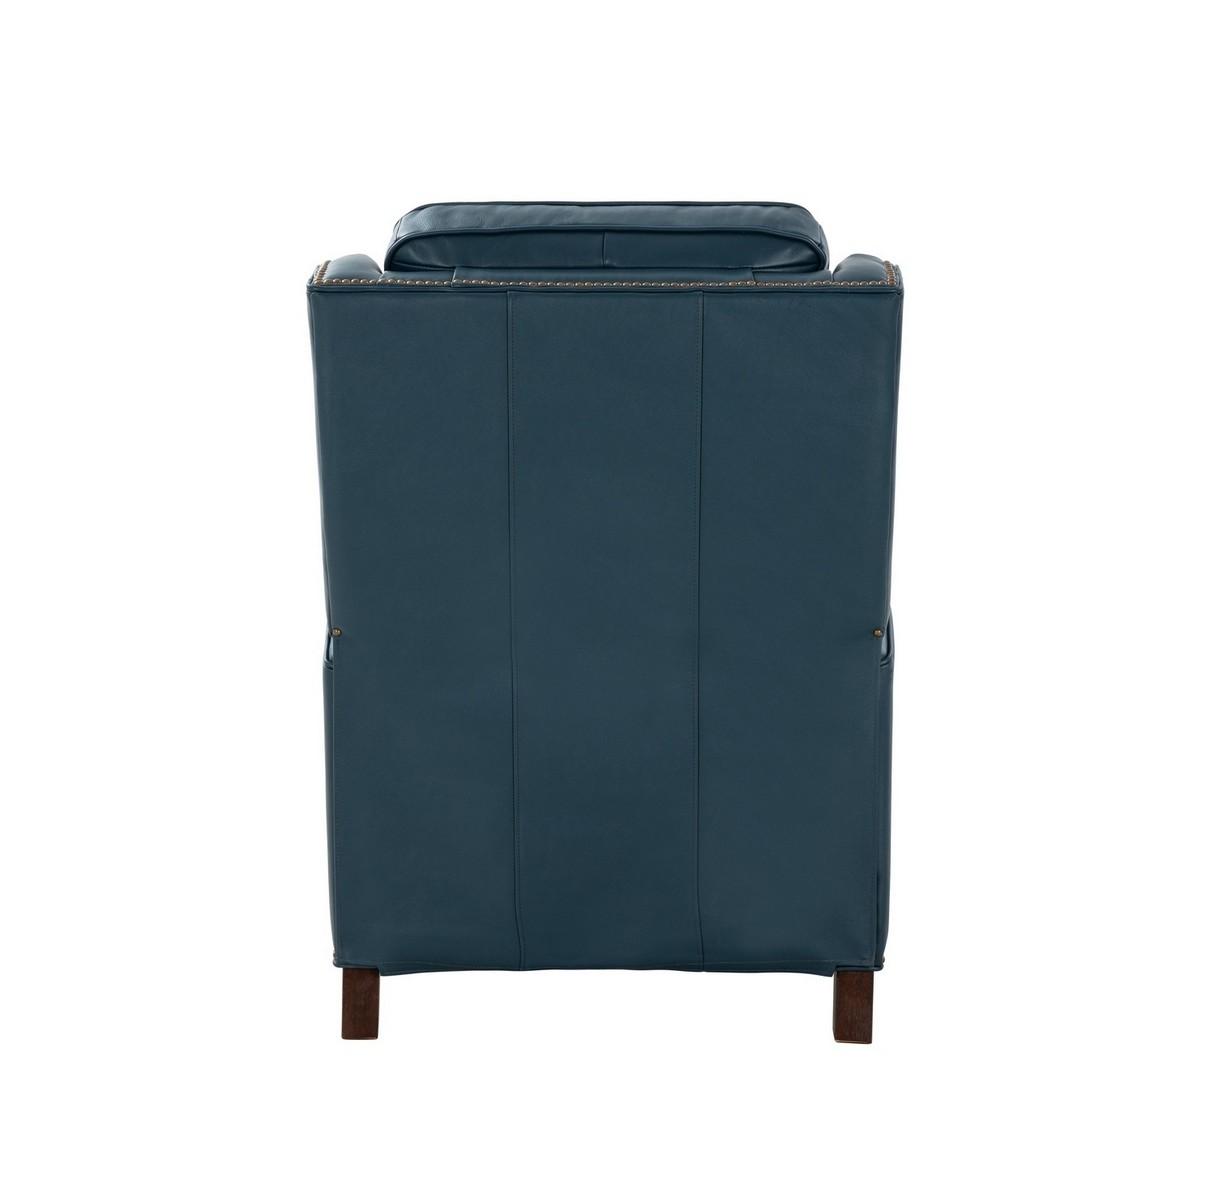 Barcalounger Van Buren Recliner Chair - Prestin Yale Blue/All Leather